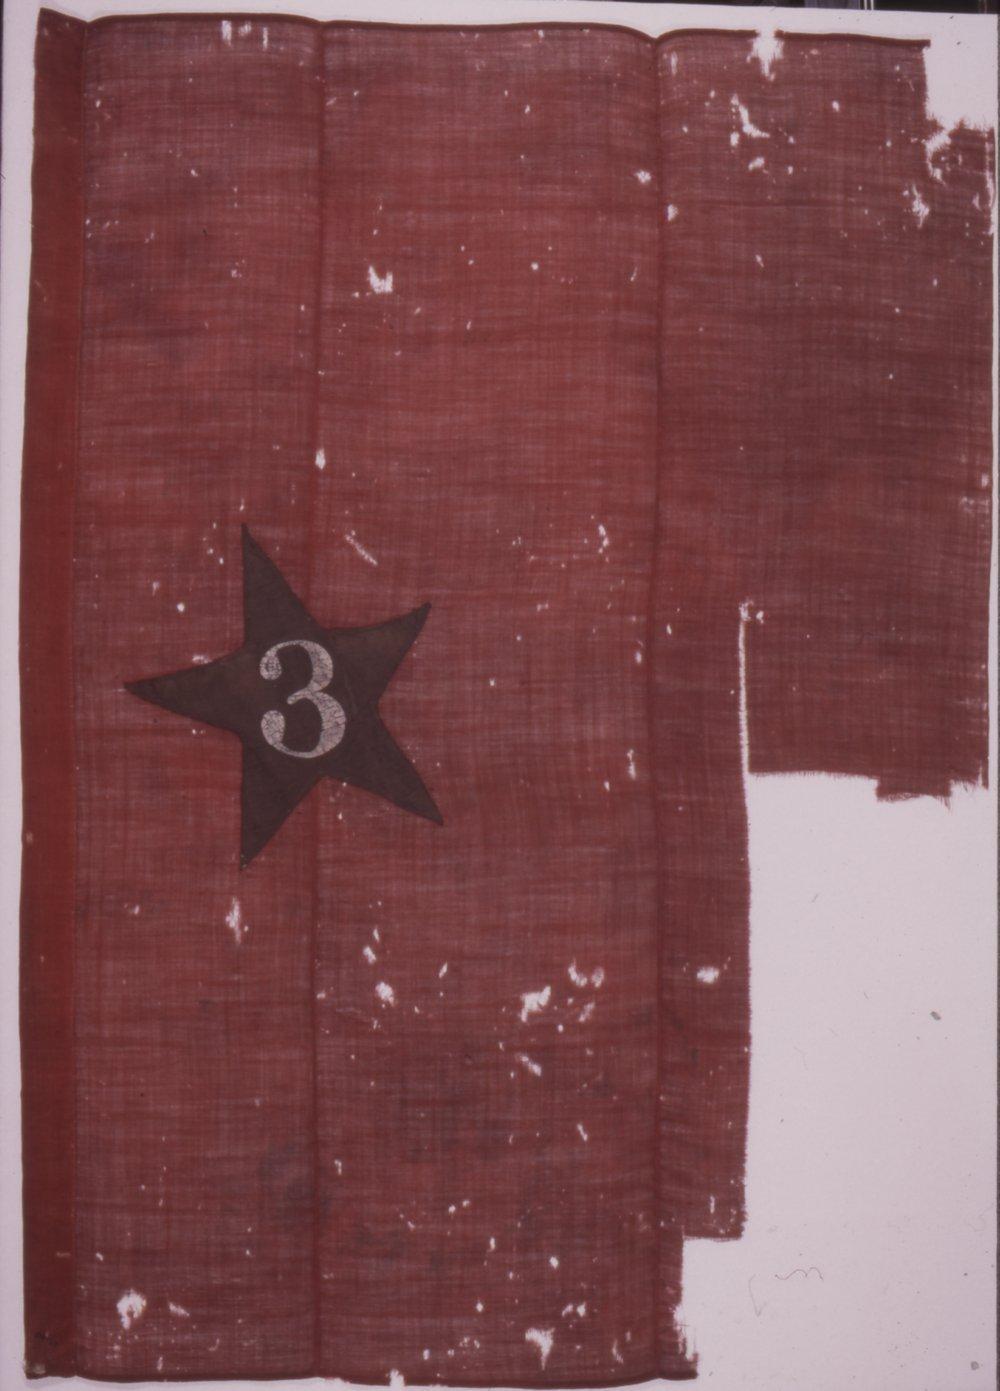 Twentieth Army Corps, First Division, Third Brigade flag